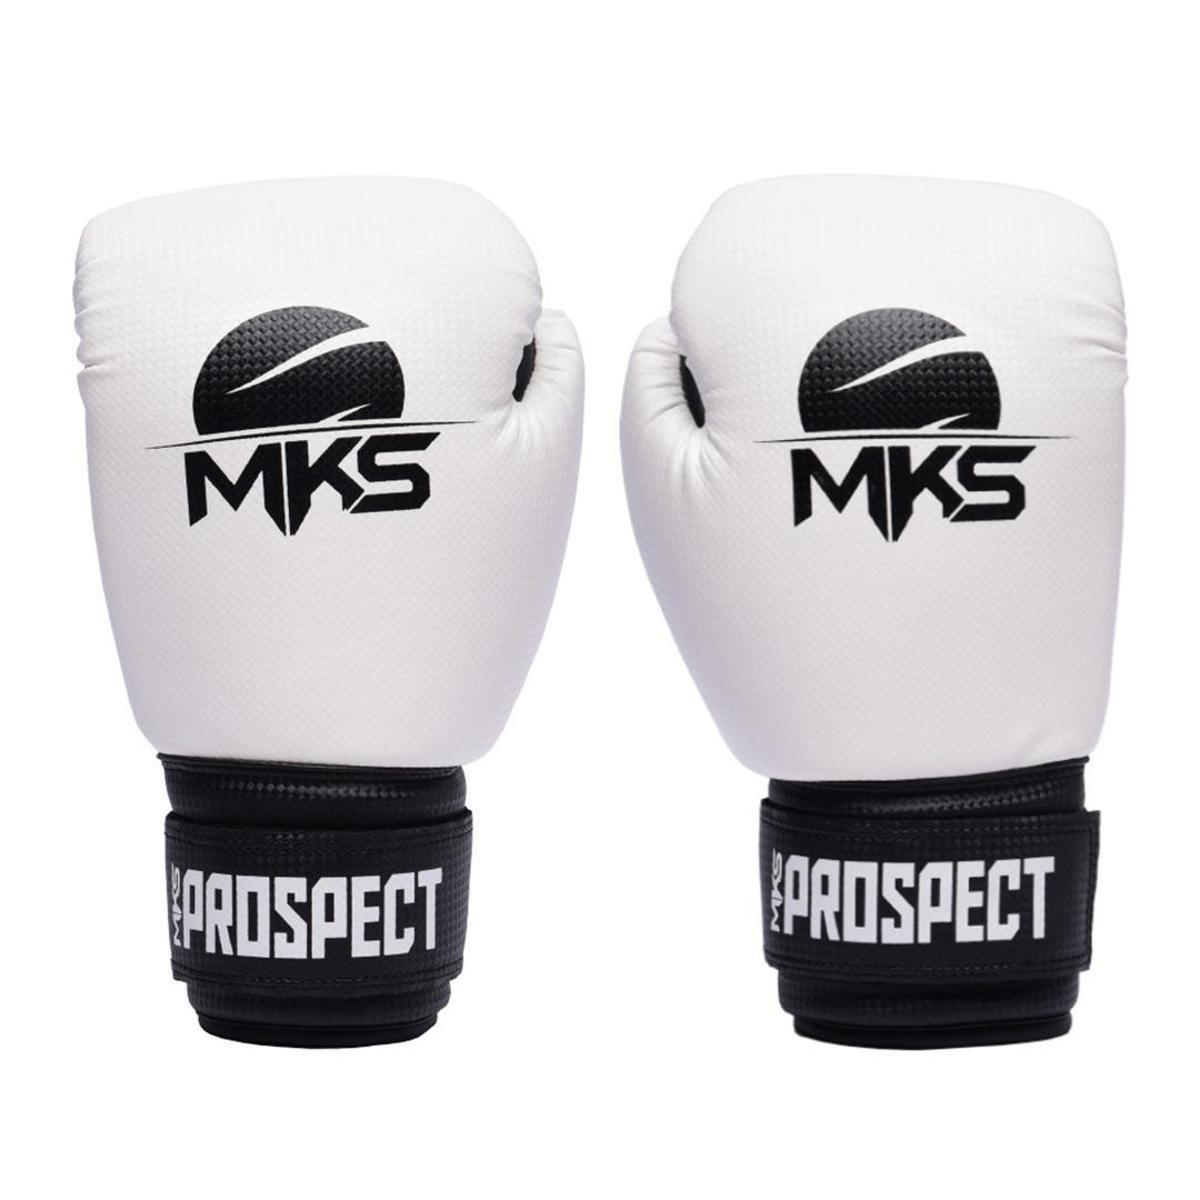 Luva Boxe MKS New Prospect - Branco